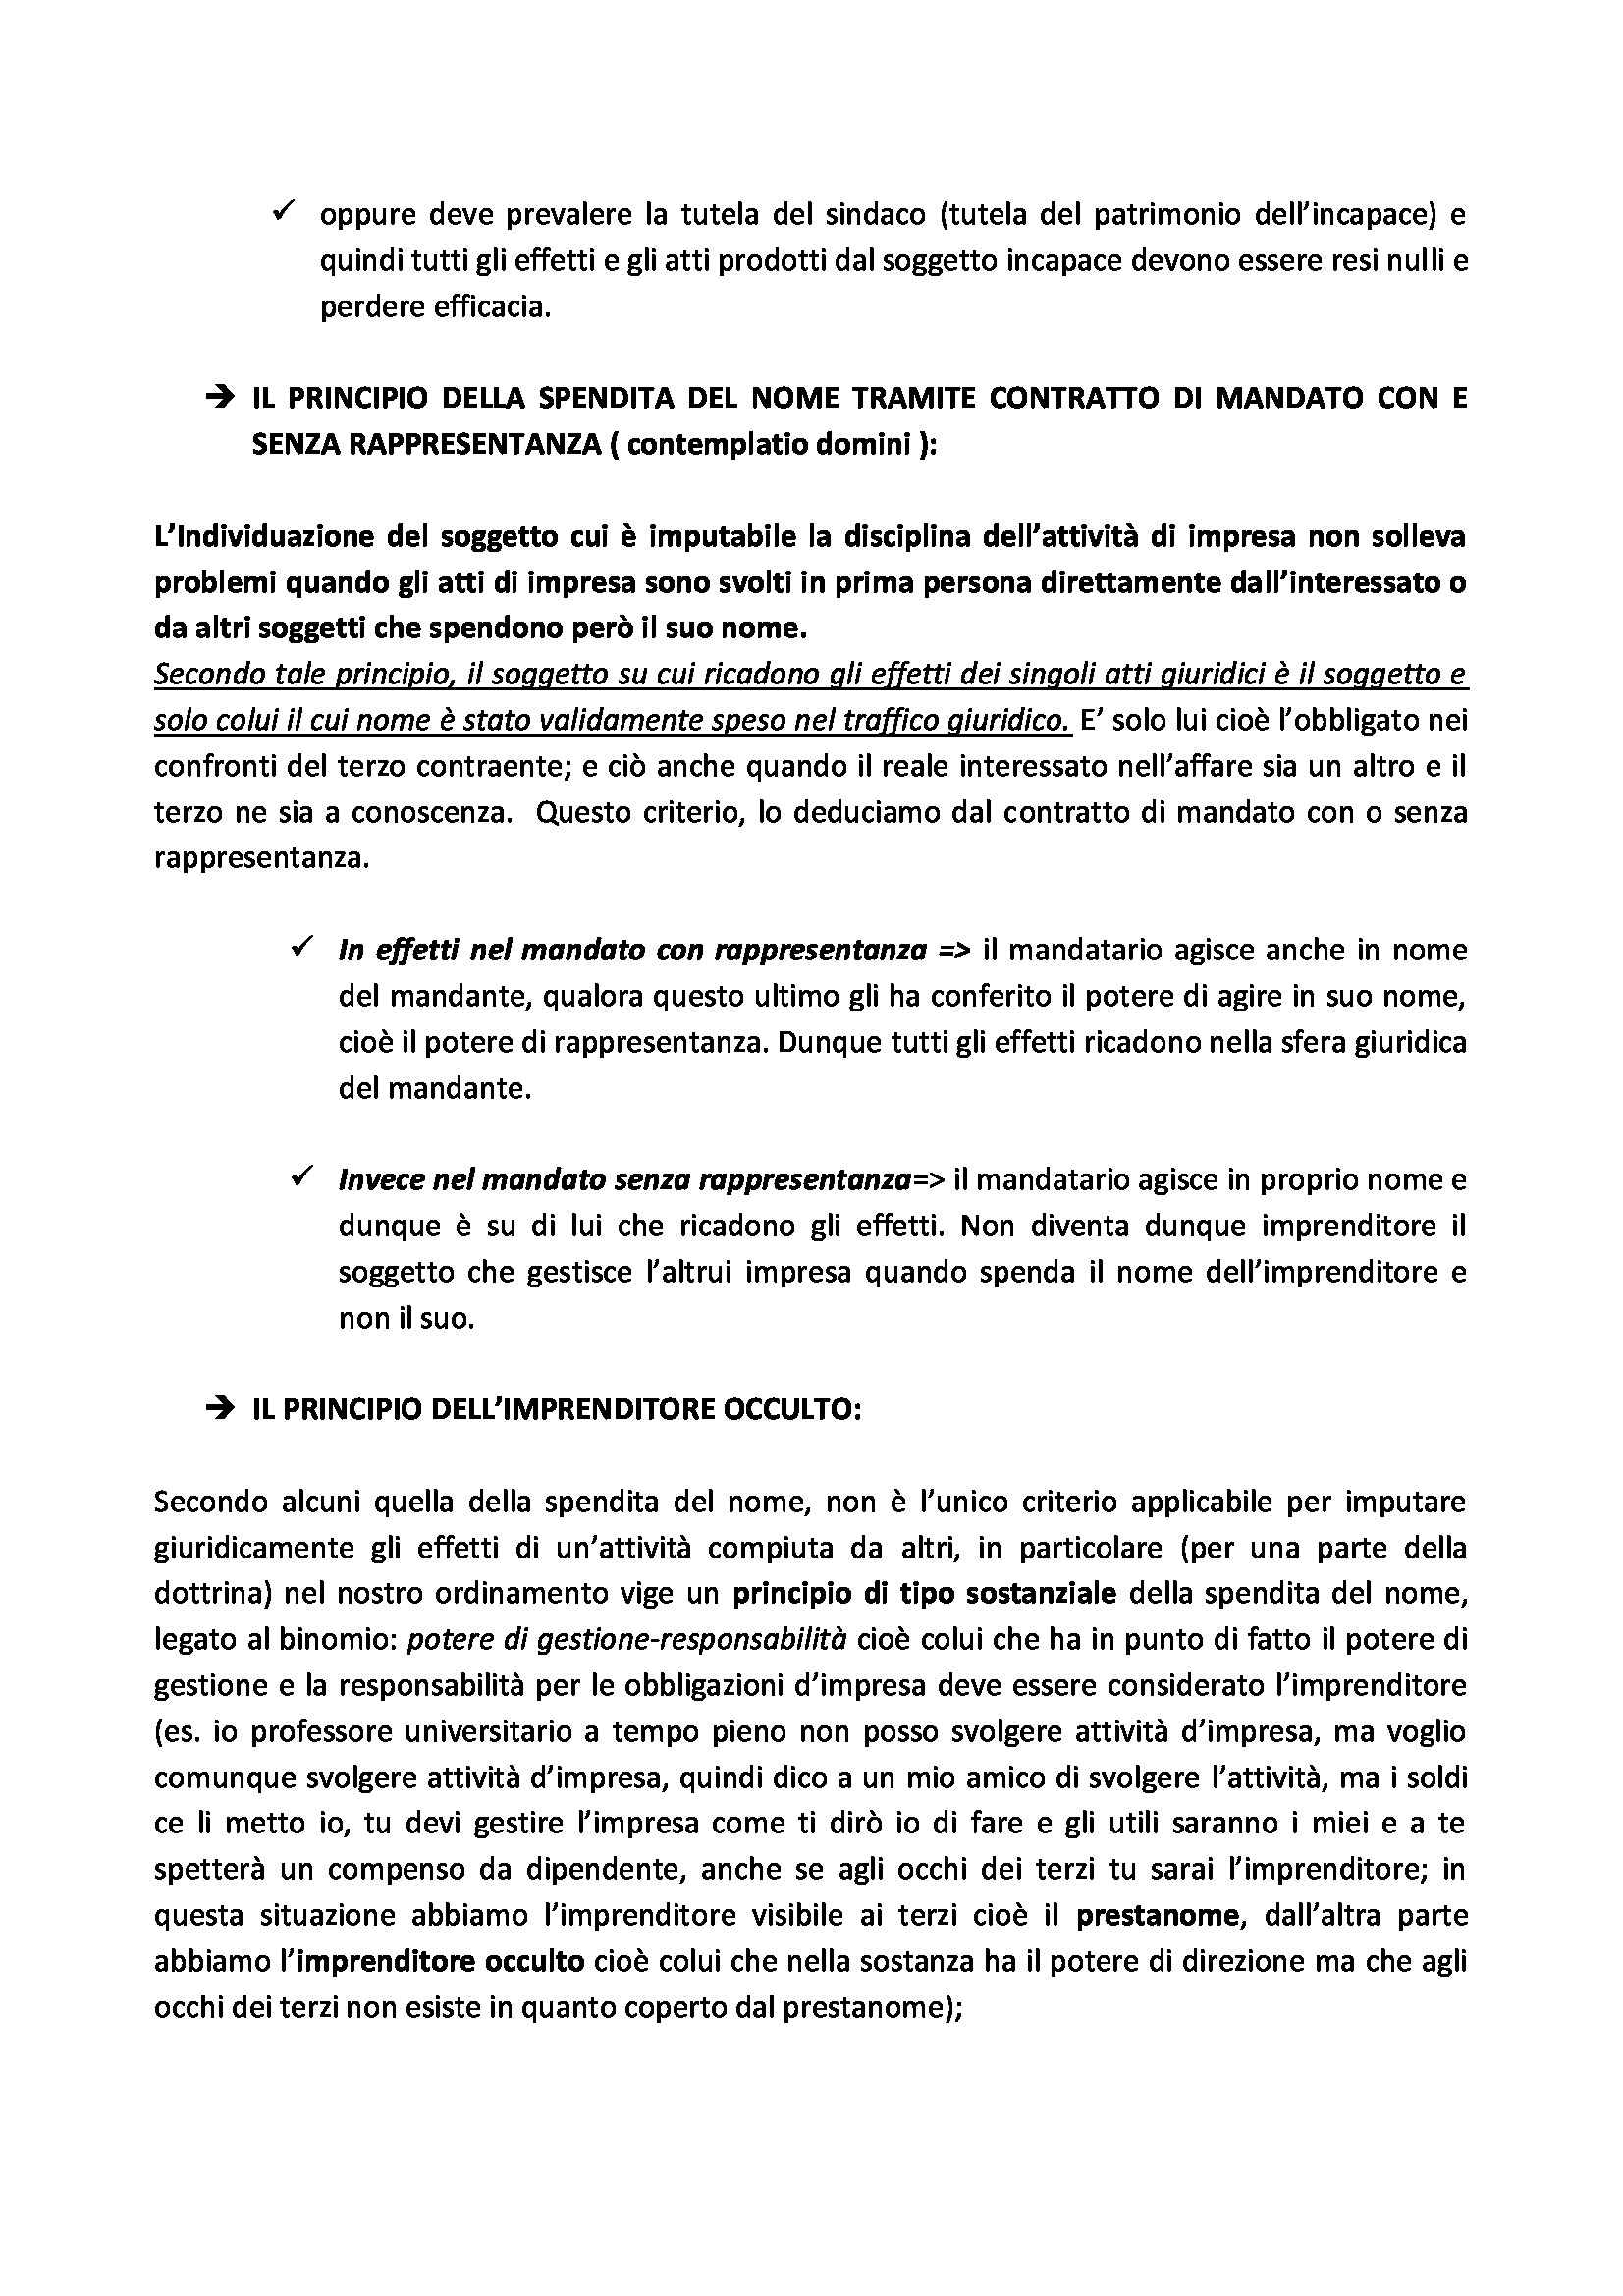 Diritto commerciale - Appunti Pag. 11